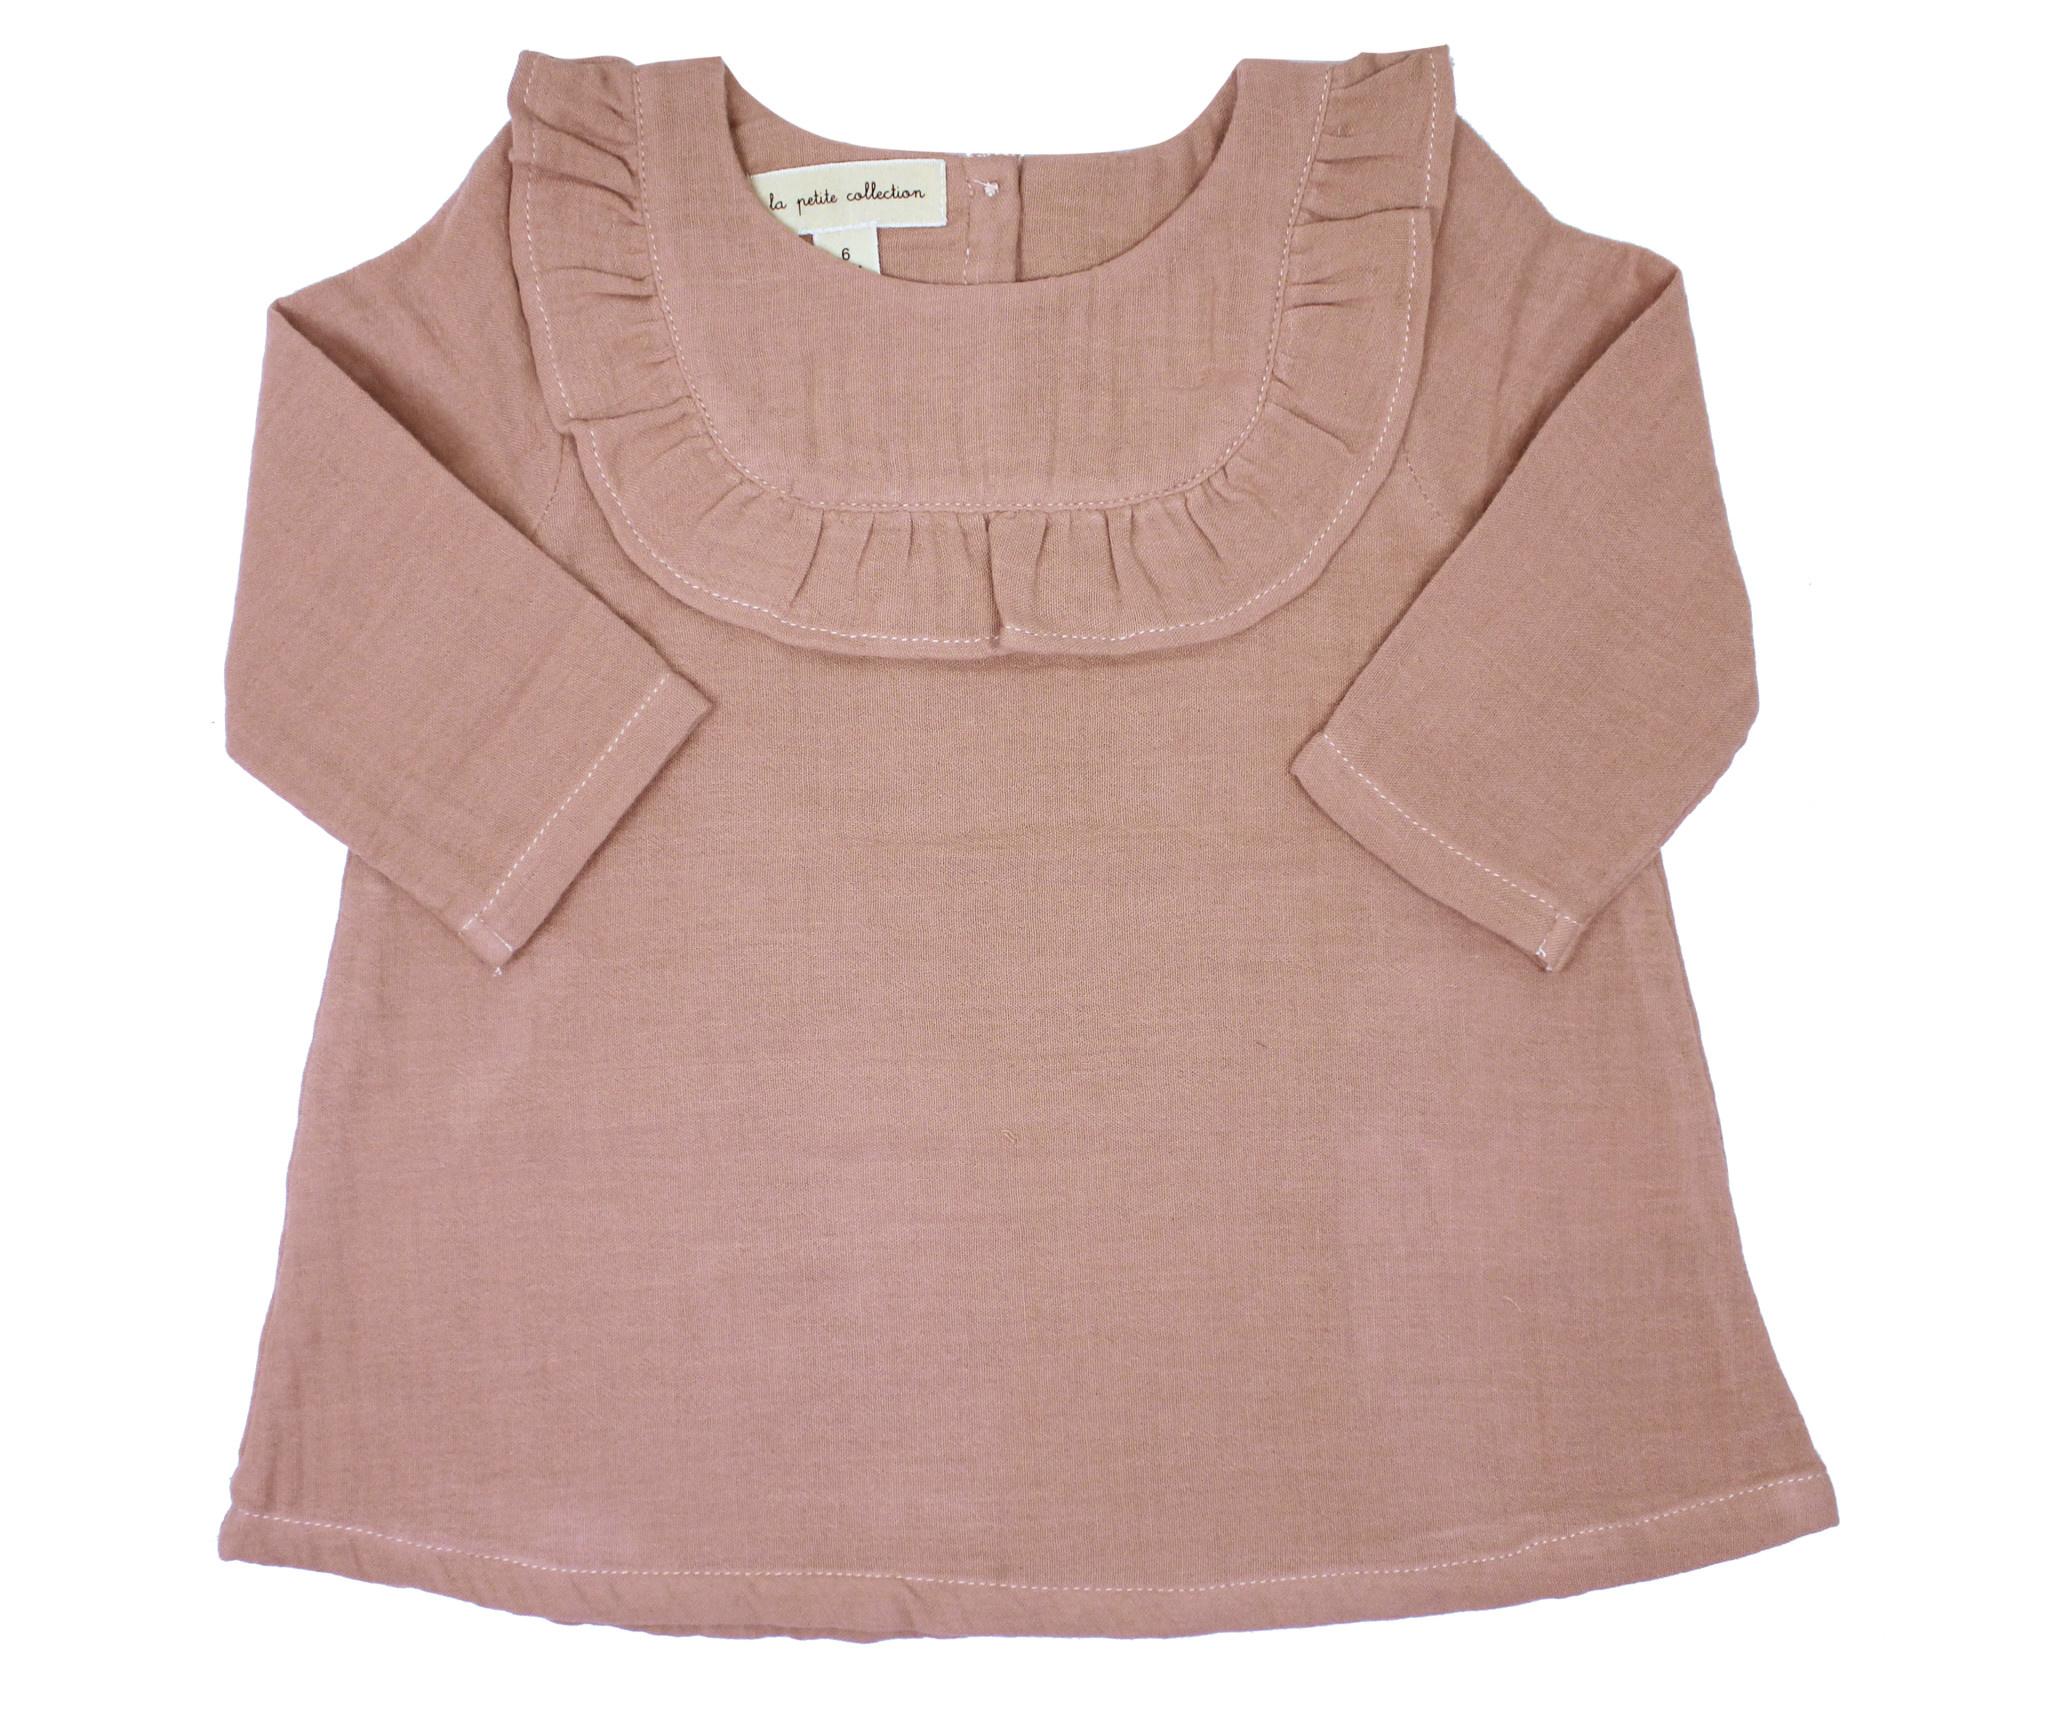 la petite collection Sand Pink Gauze Dress